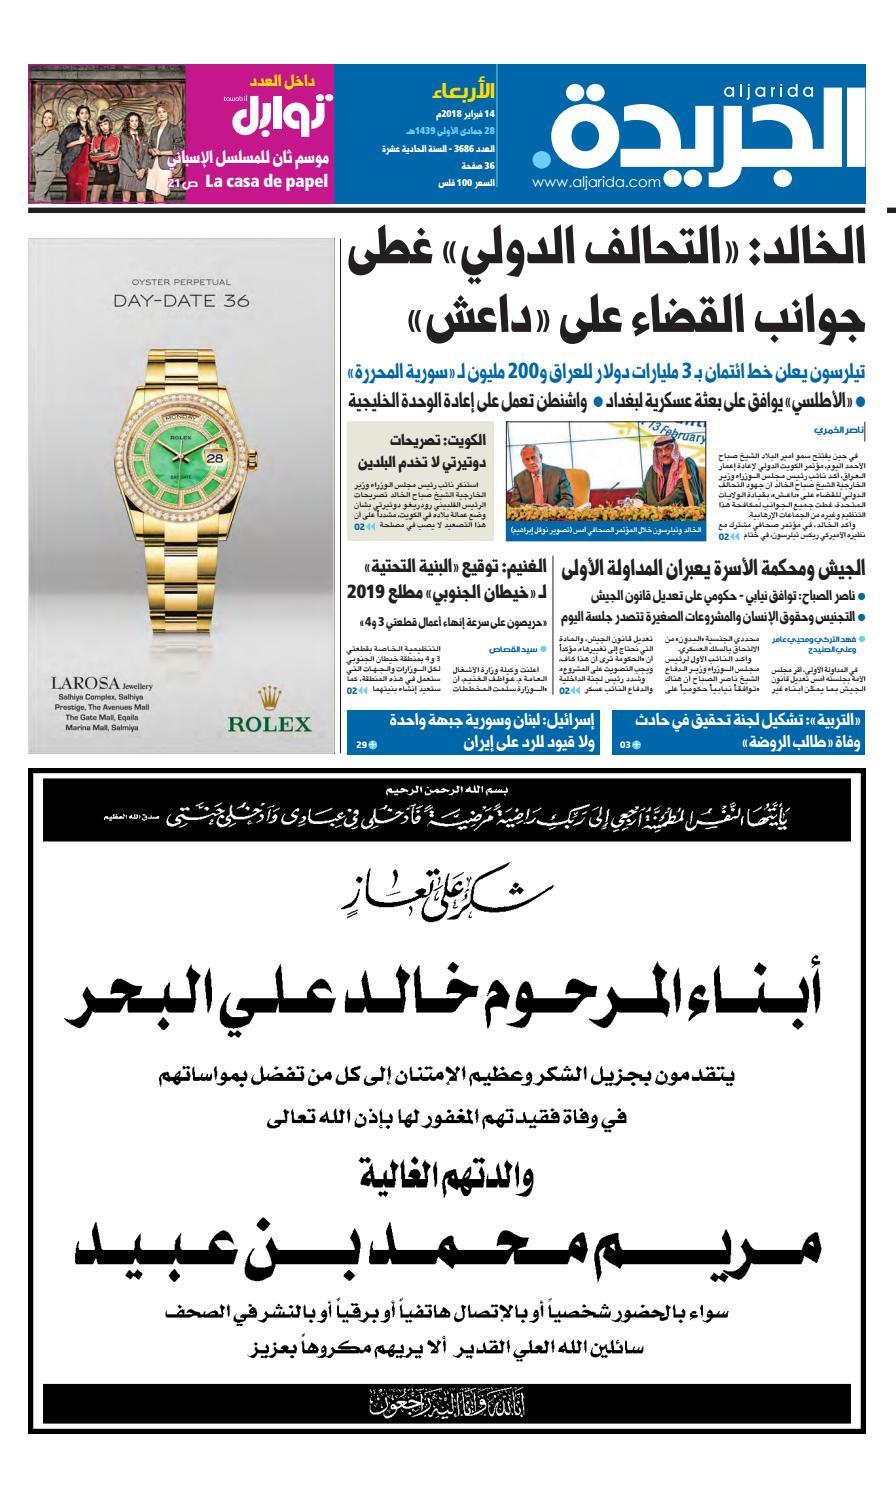 d55f2f0c076d9 عدد الجريدة الأربعاء 14 فبراير 2018 by Aljarida Newspaper - issuu